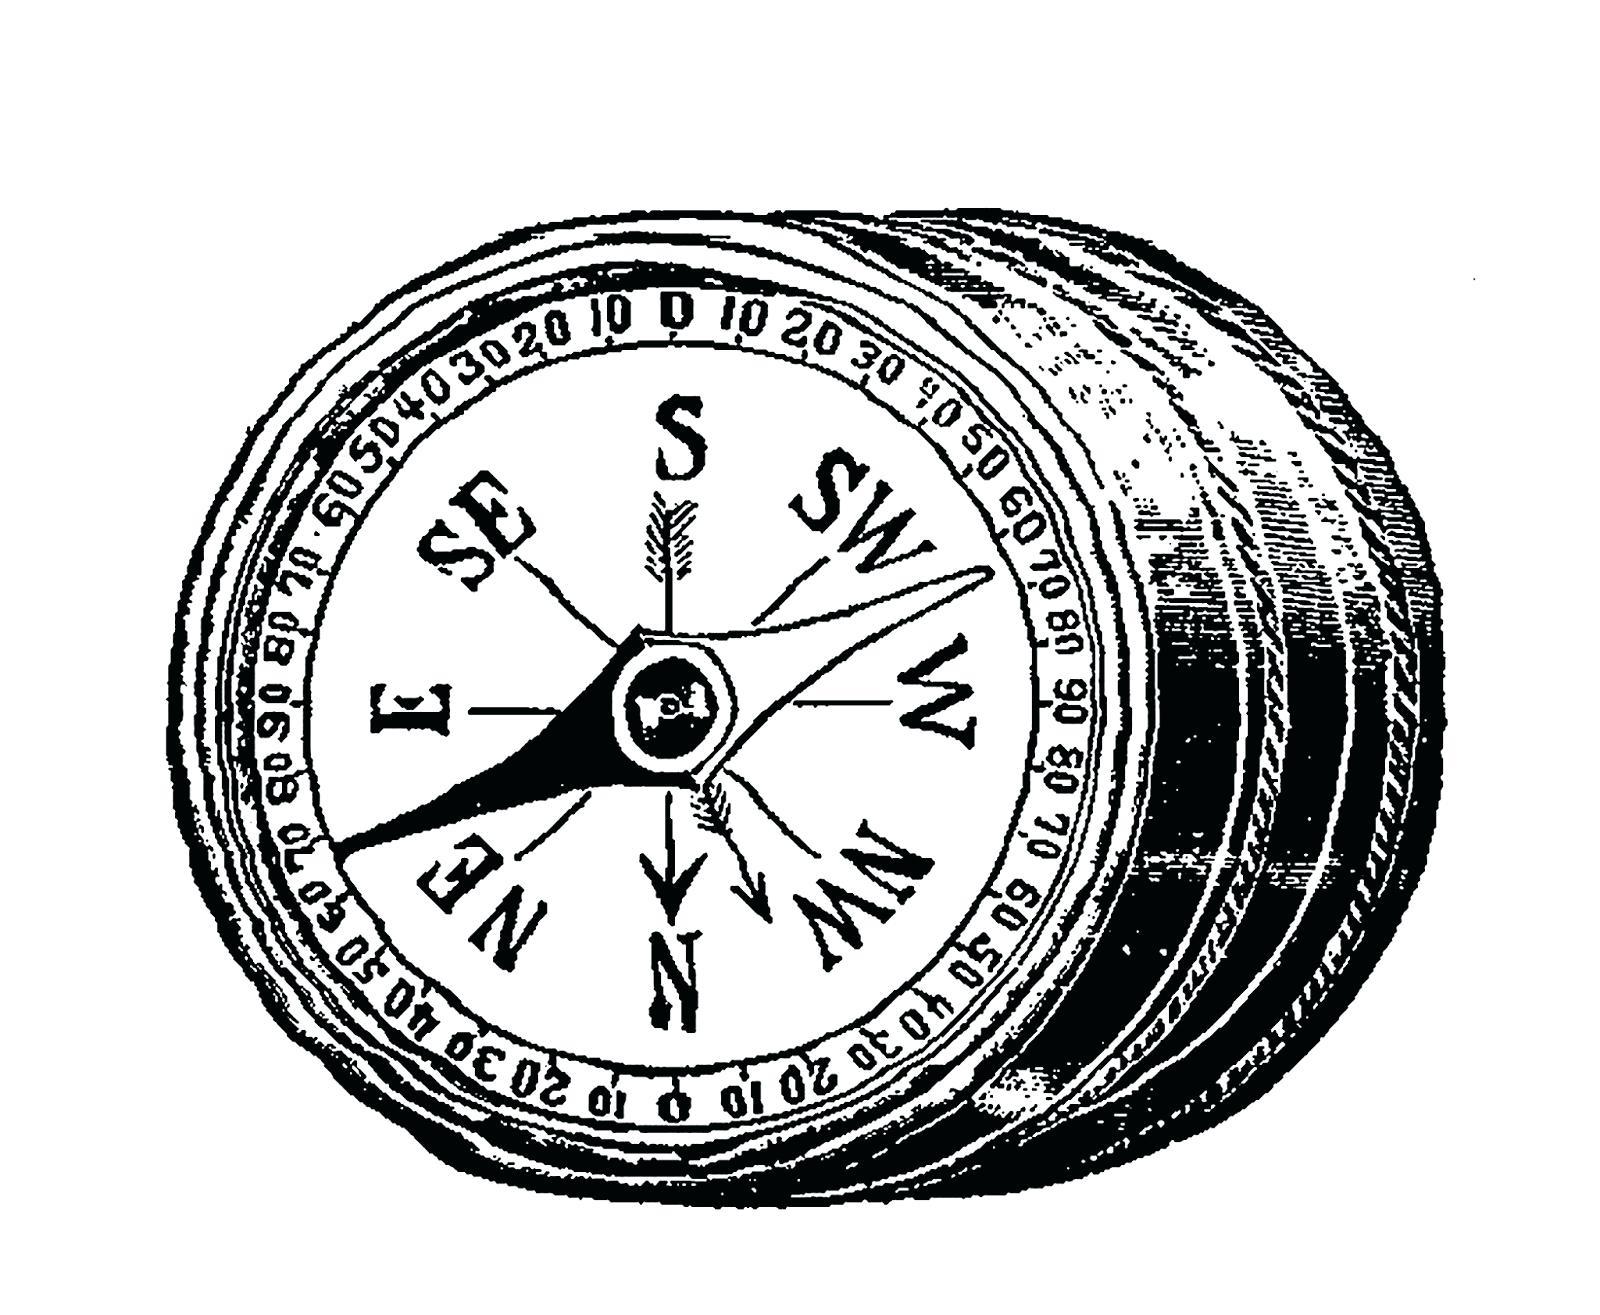 1600x1315 Printable Printable Degree Wheel Compass Antique Images Vintage